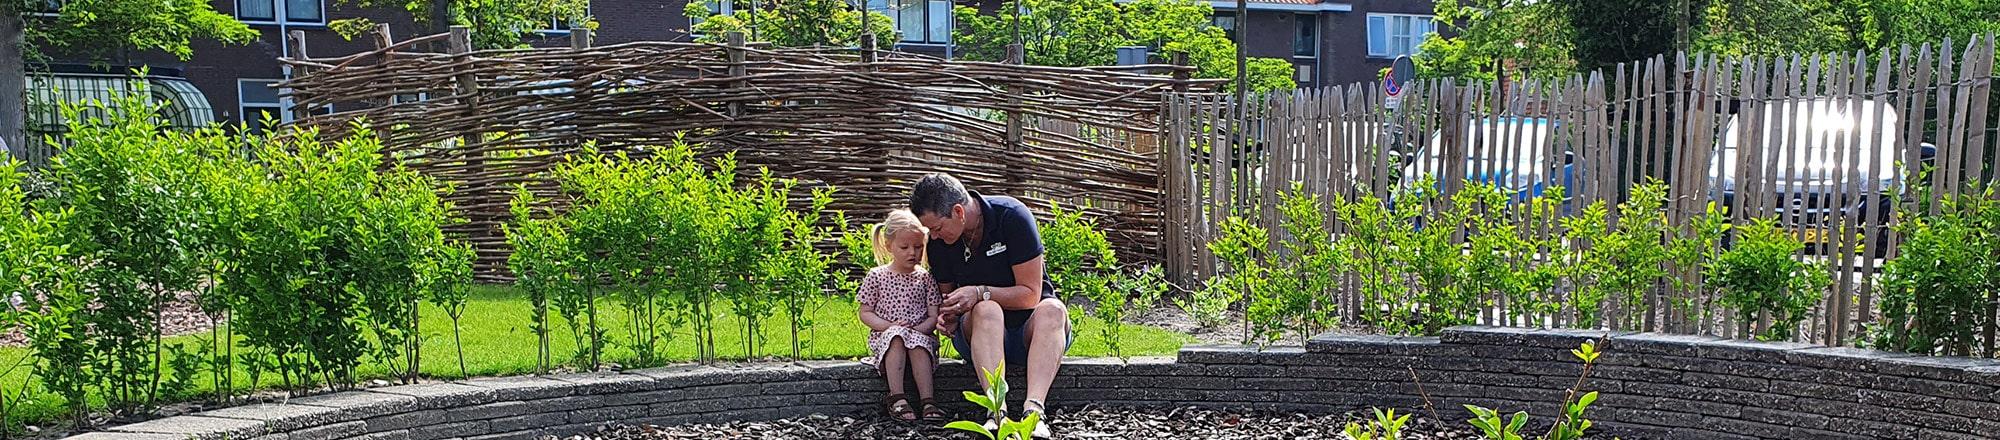 Tuin kinderdagverblijf de Tuimelaars